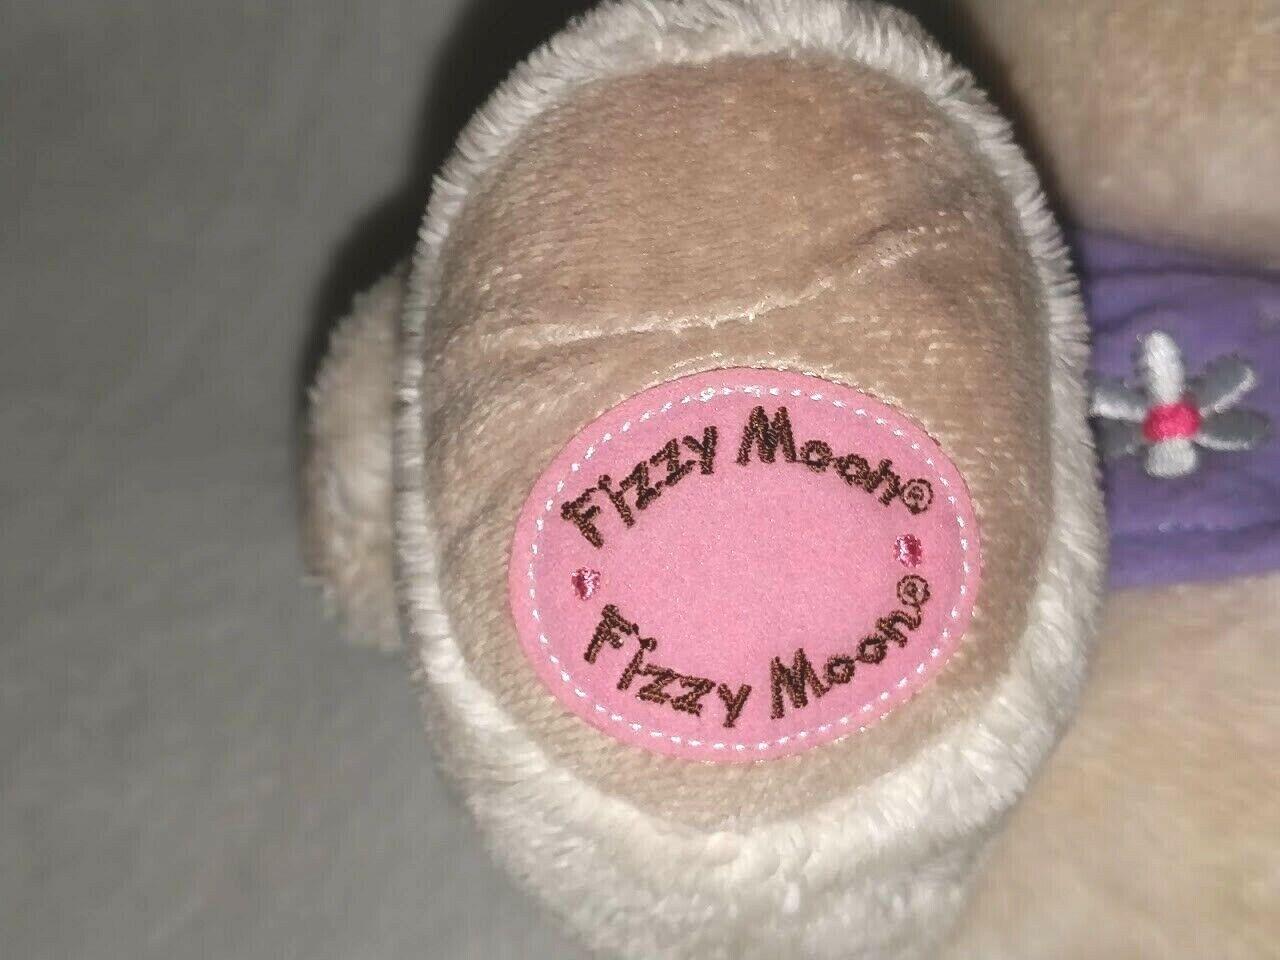 FIZZY MOON PLUSH giocattolo Monchiave PAPER ISLe LTD LTD LTD 8  viola - Mum 1f5470